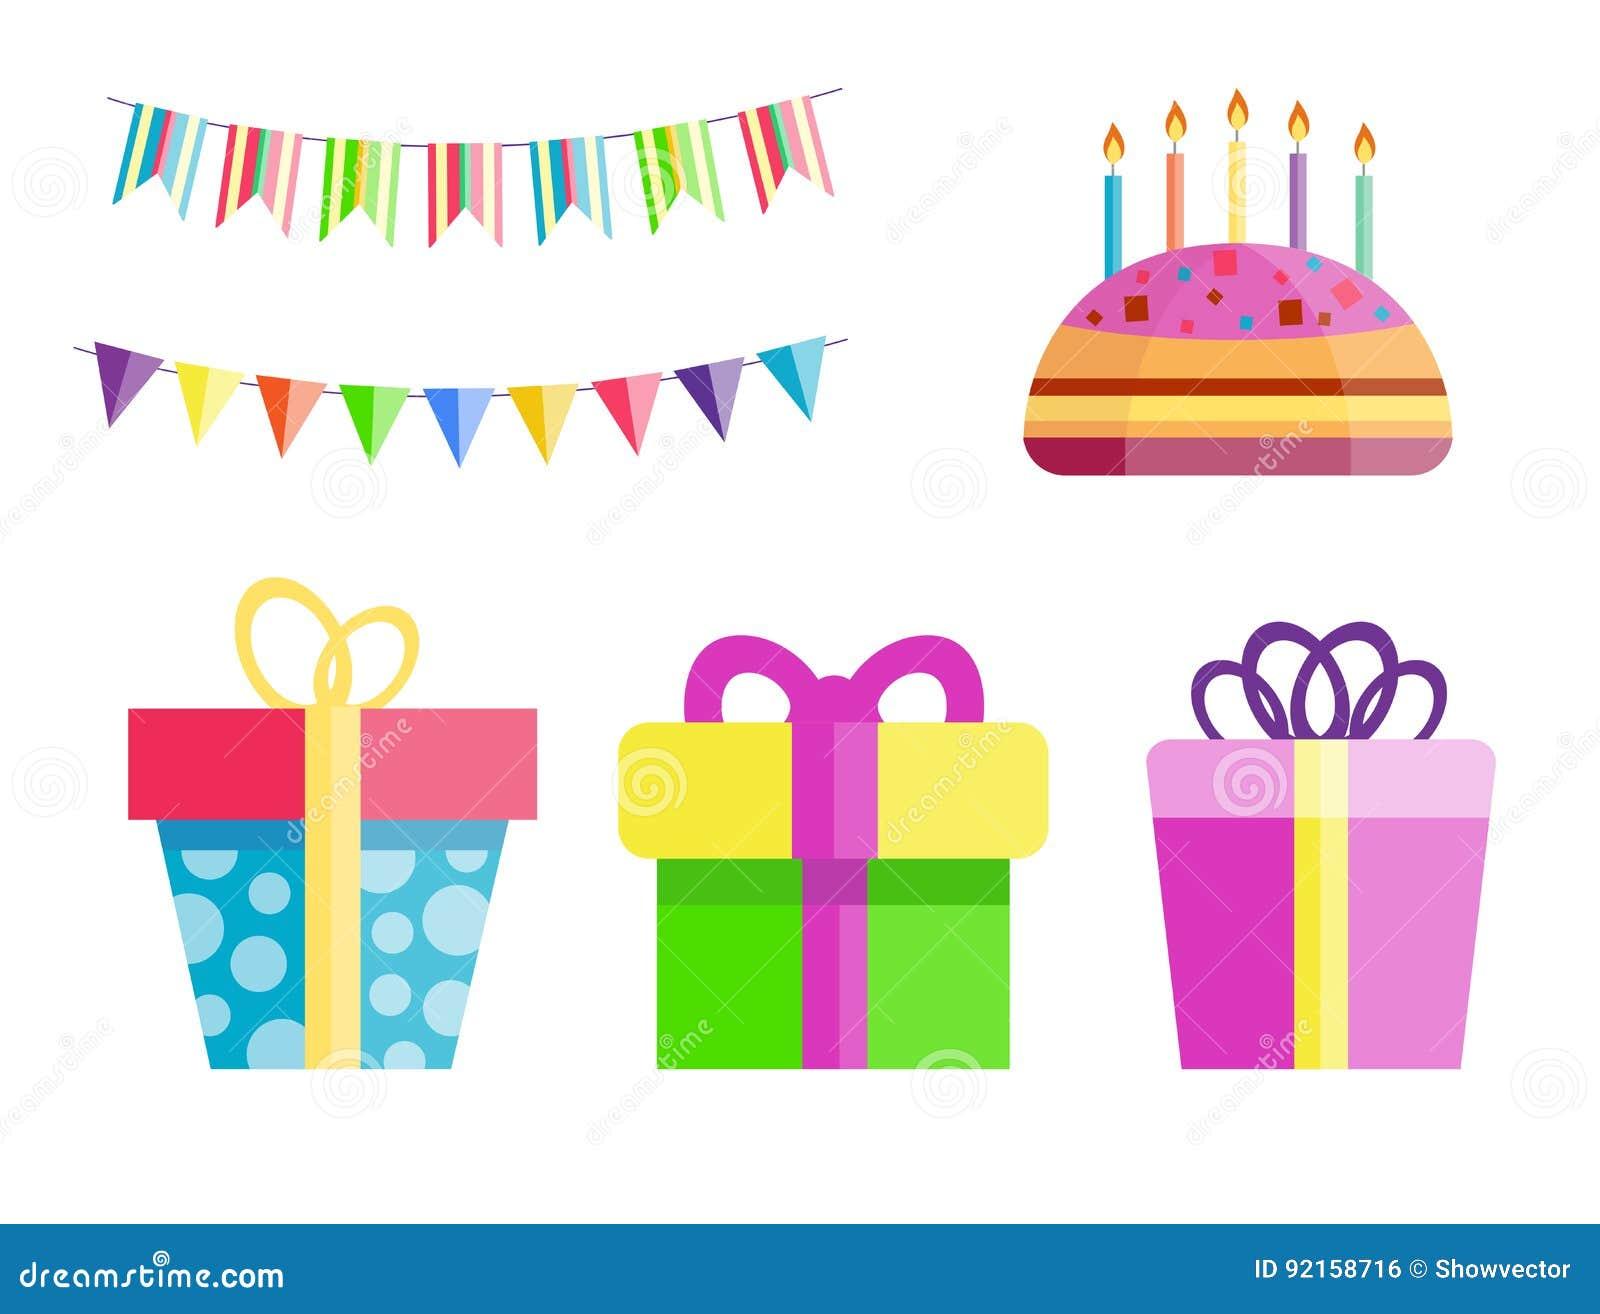 Party Gift Box Celebration Happy Birthday Surprise Decoration Event